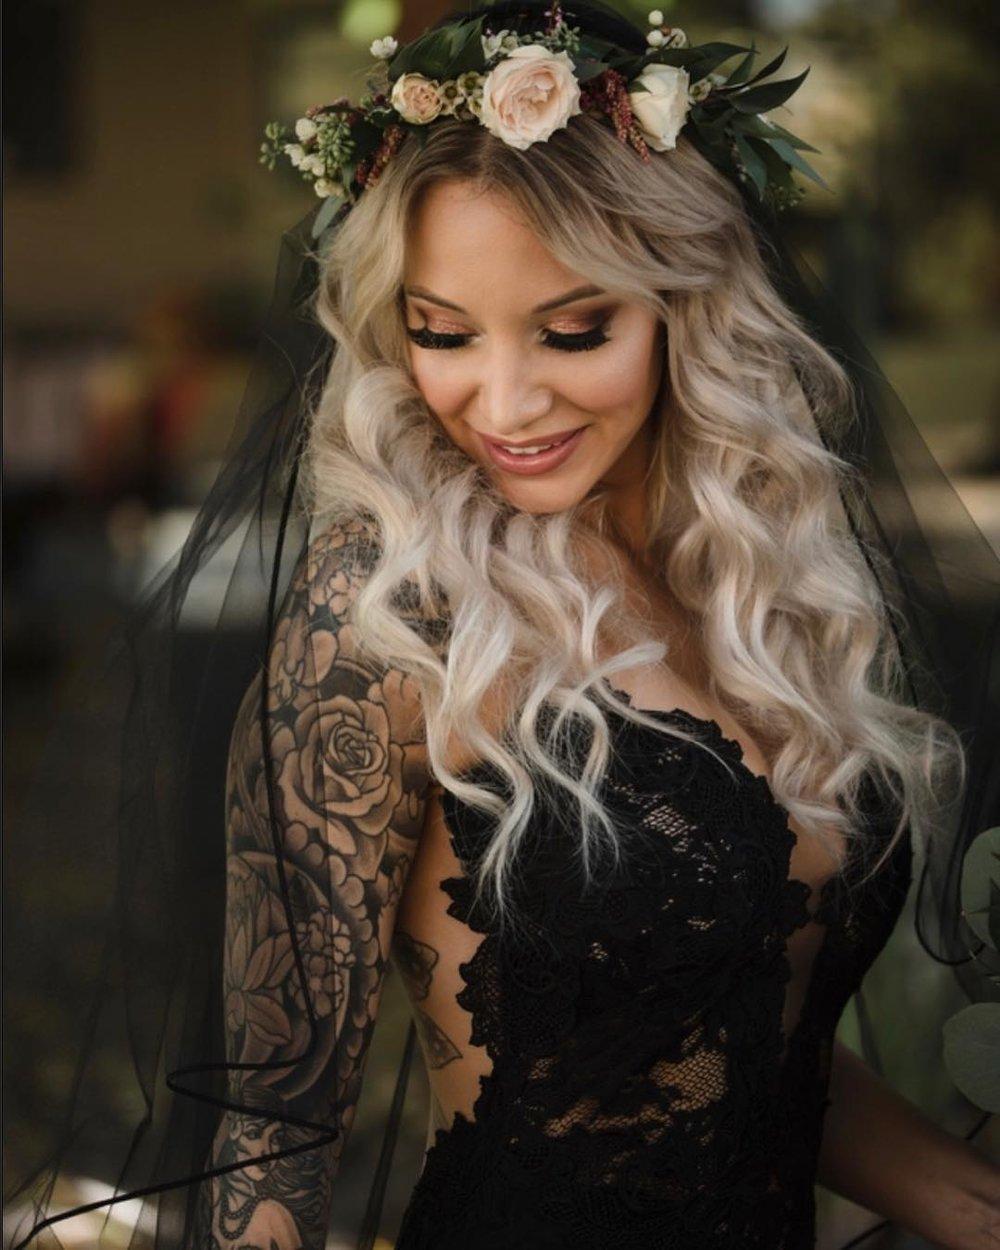 Photo: Jessica Roman |  @jessicaroman__   Makeup:  @makeup_bysusie   Dress: Dress: Olvis |  @olvis_